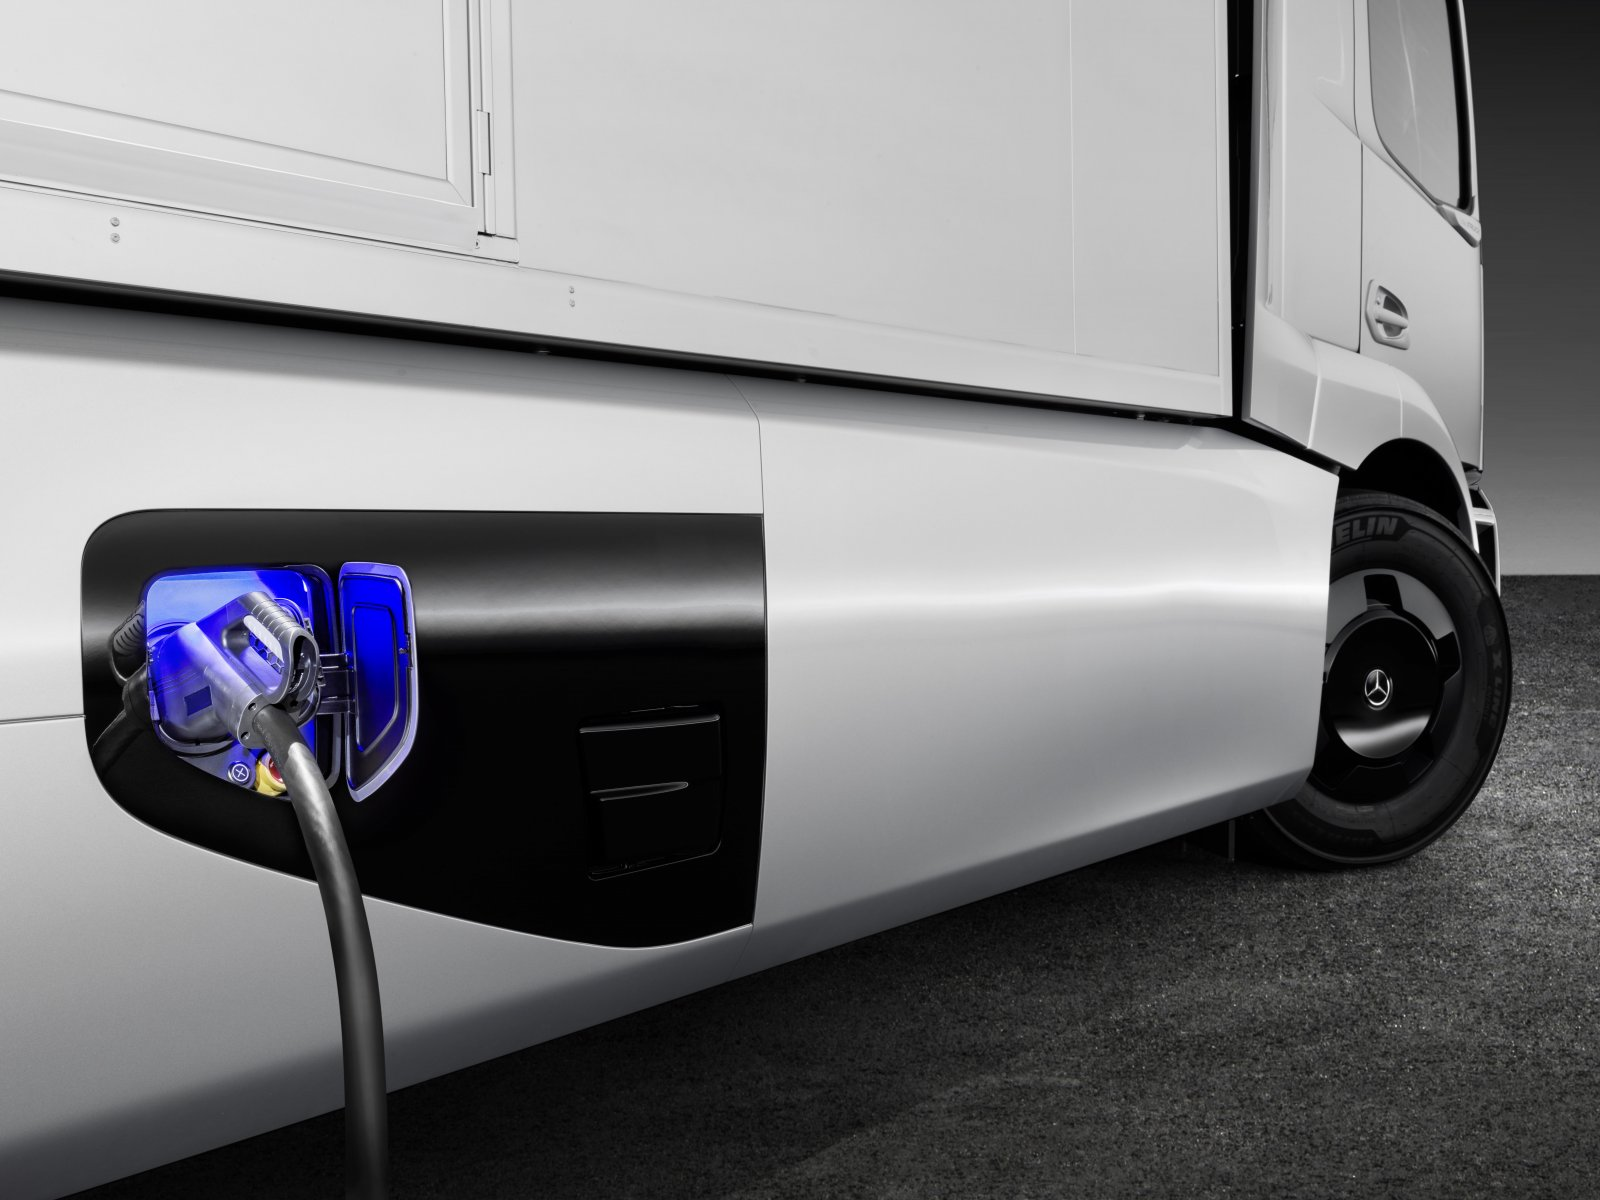 Mercedes-Benz urban eTruck, 212kWh, 20 mil räckvidd, 26 ton totalvikt